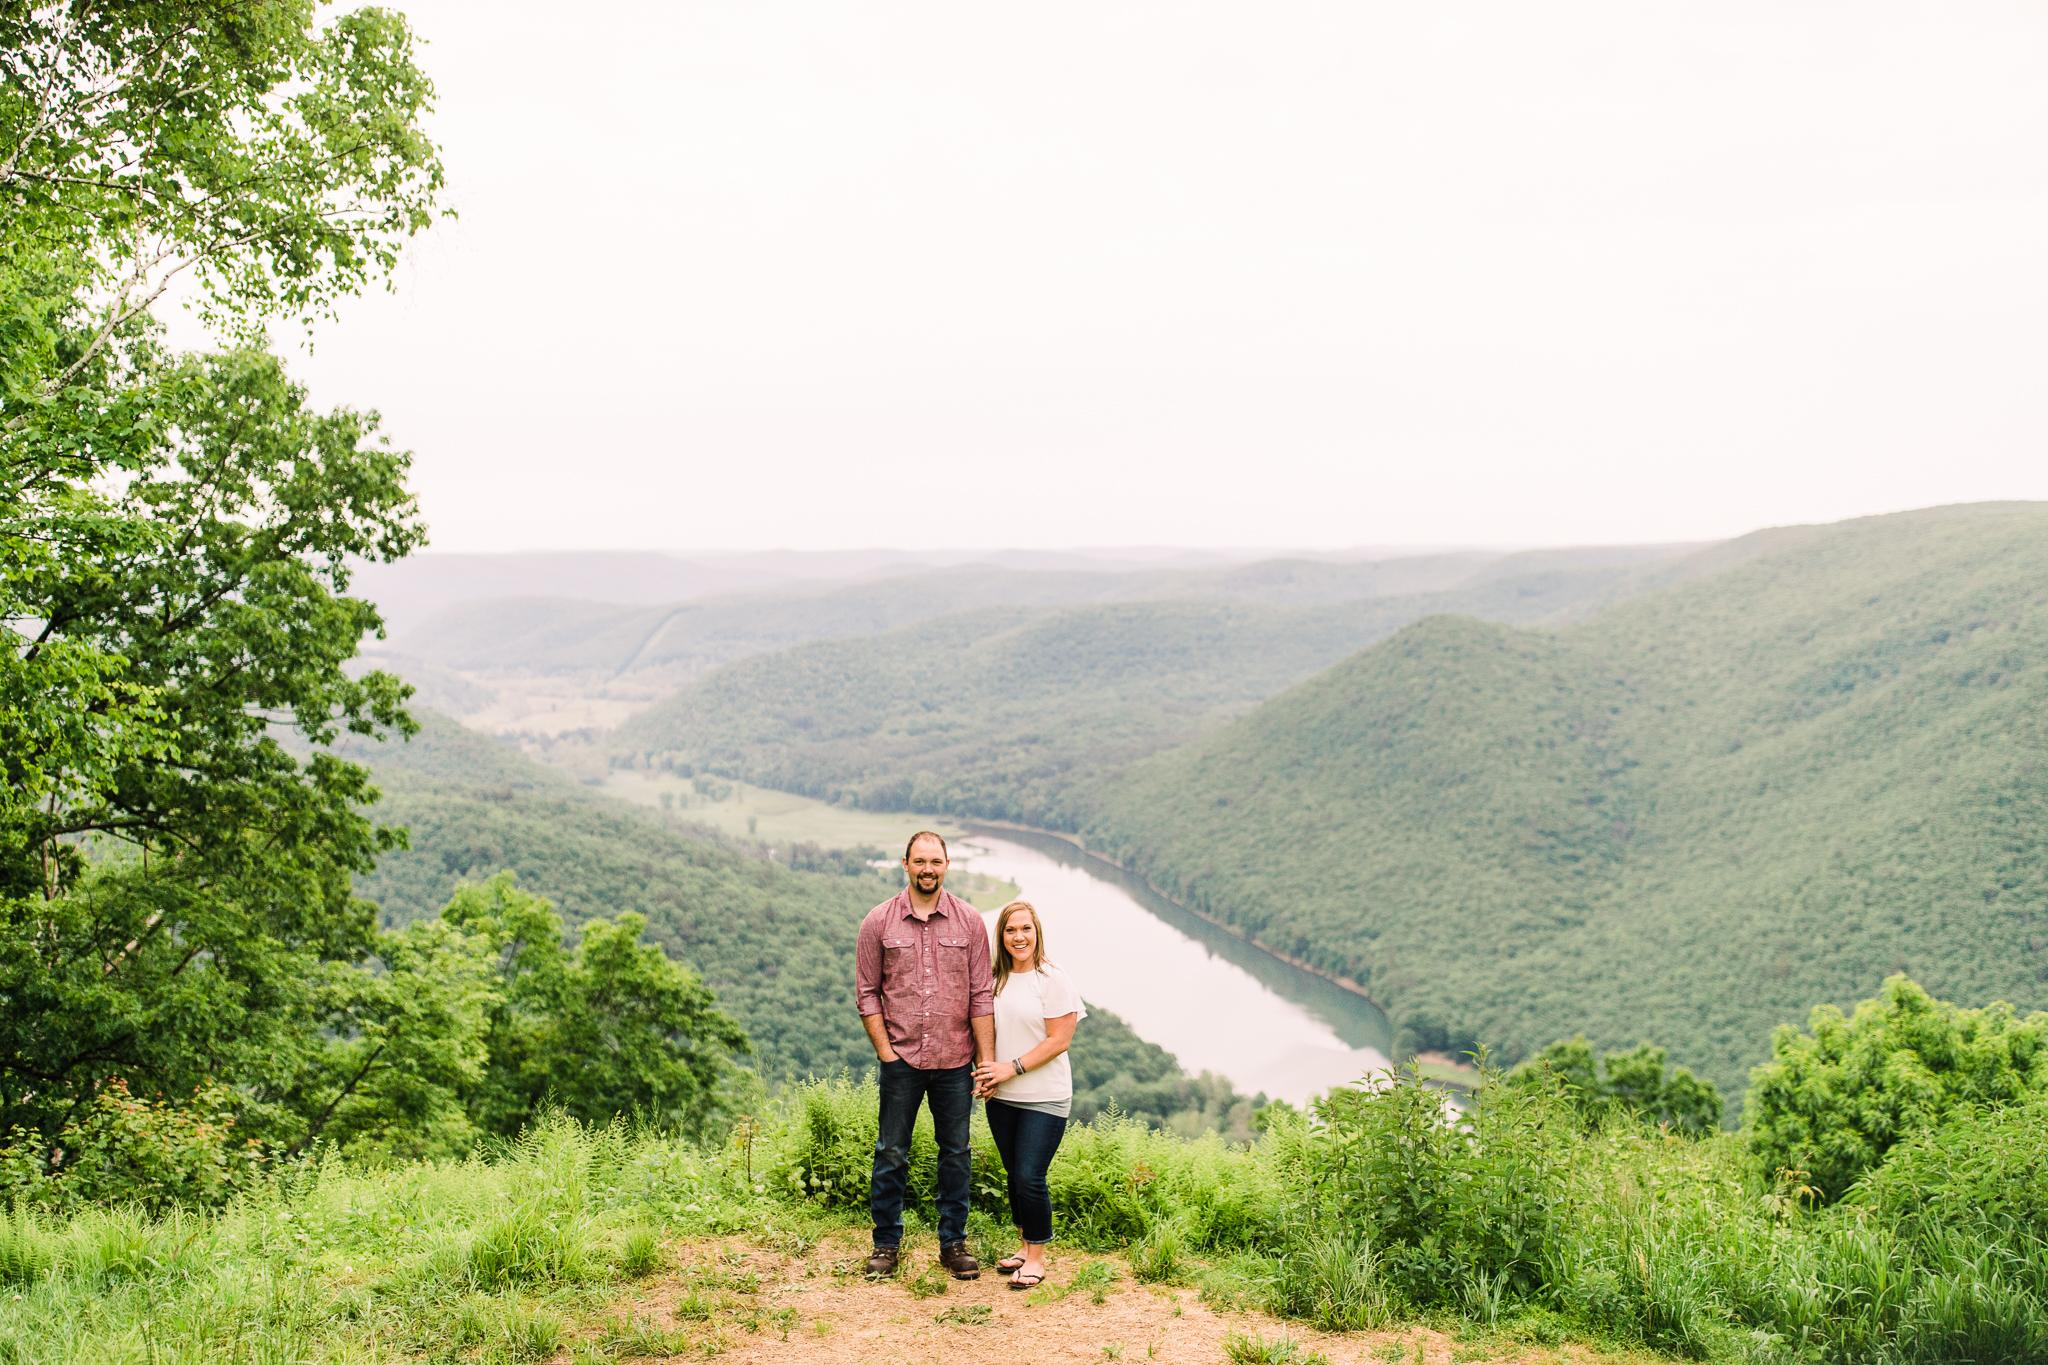 Kettle-creek-state-park-engagement-9734.jpg